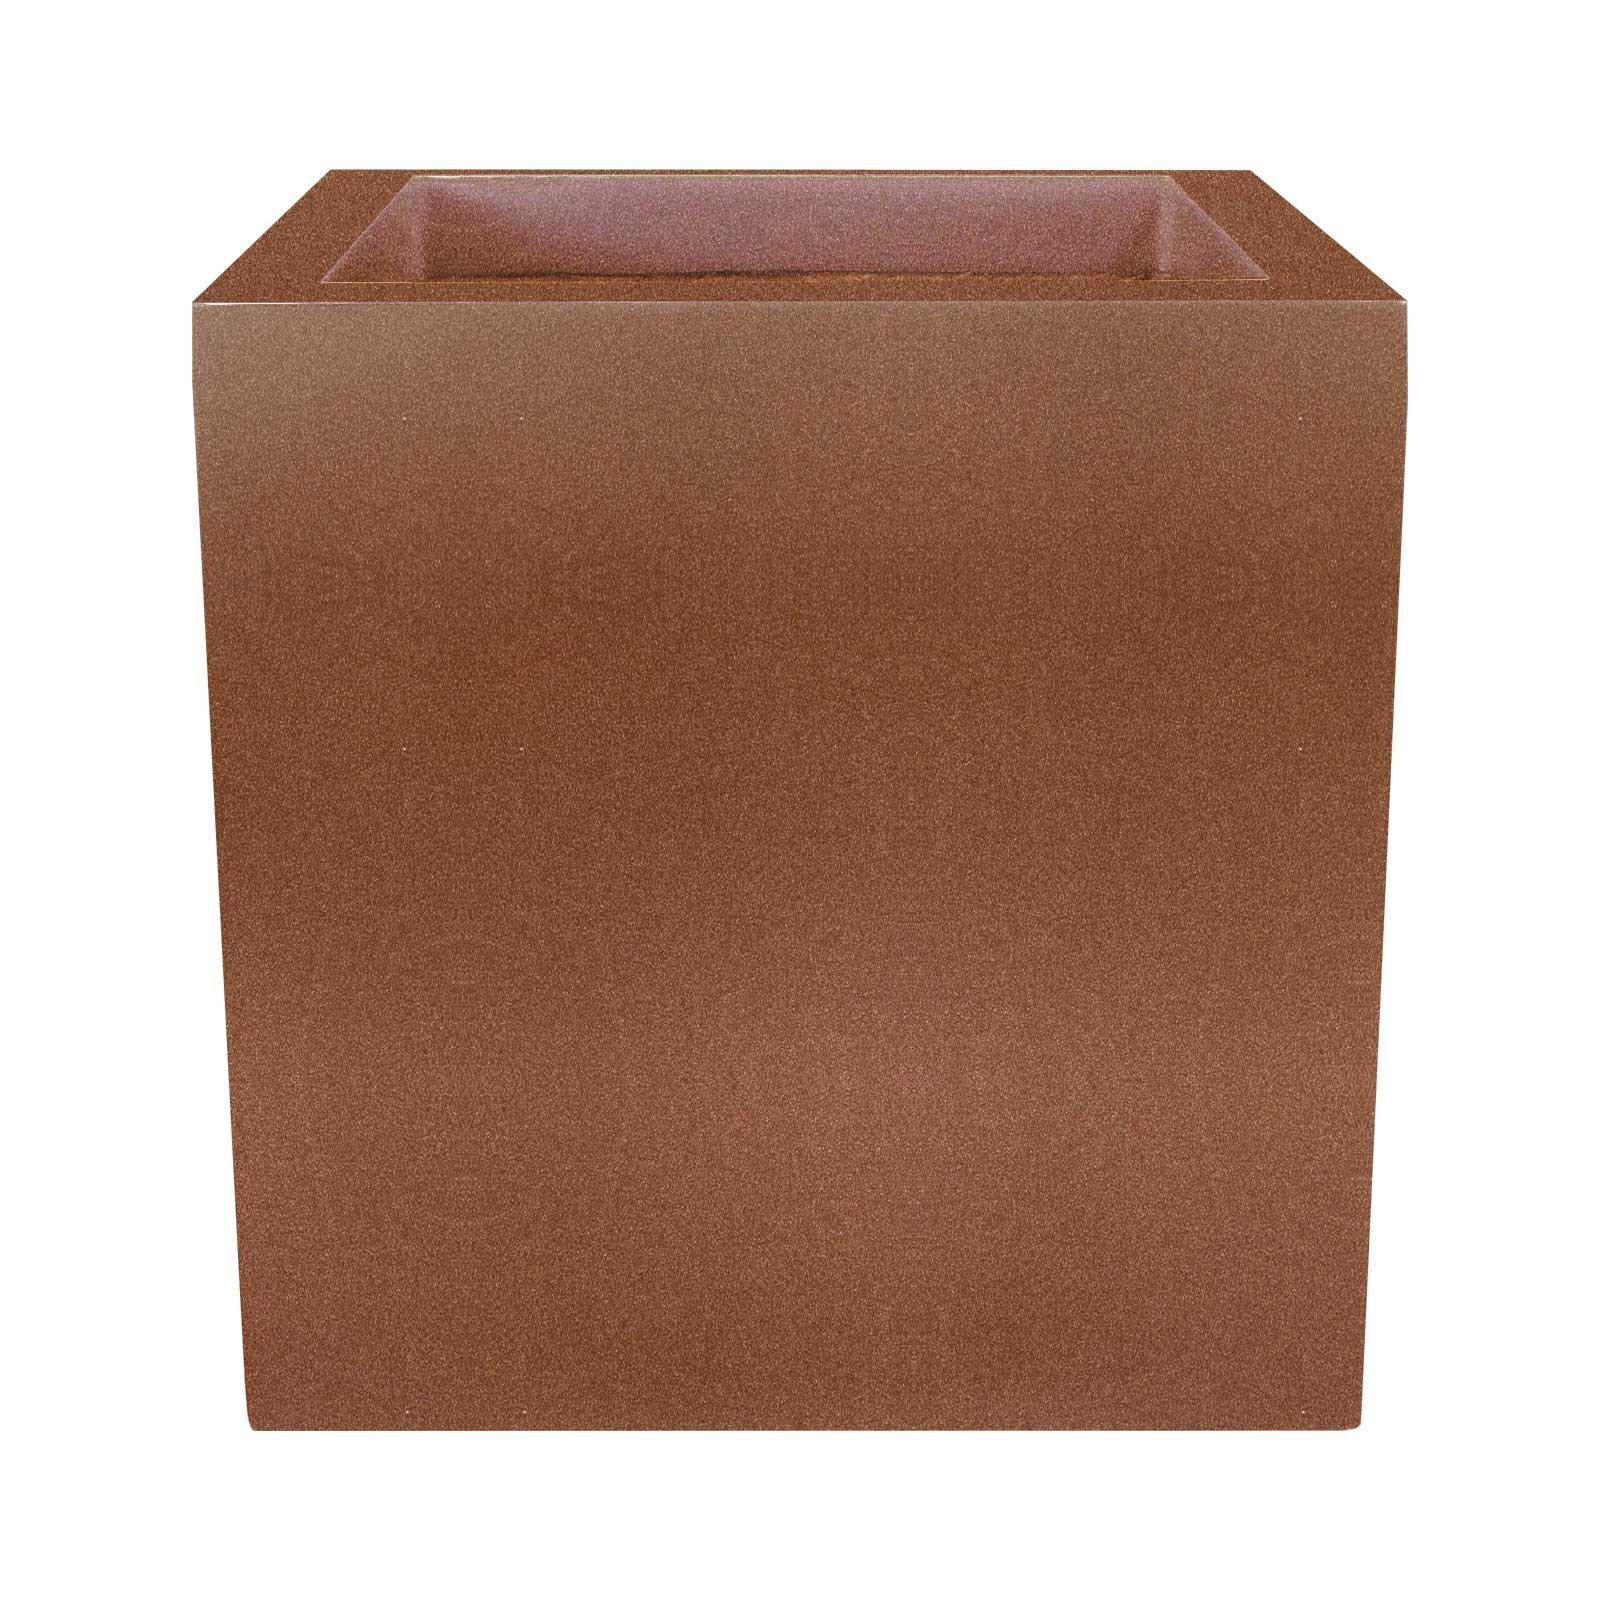 Square Planter Boxes - Fiberglass - 32'/36'/40'